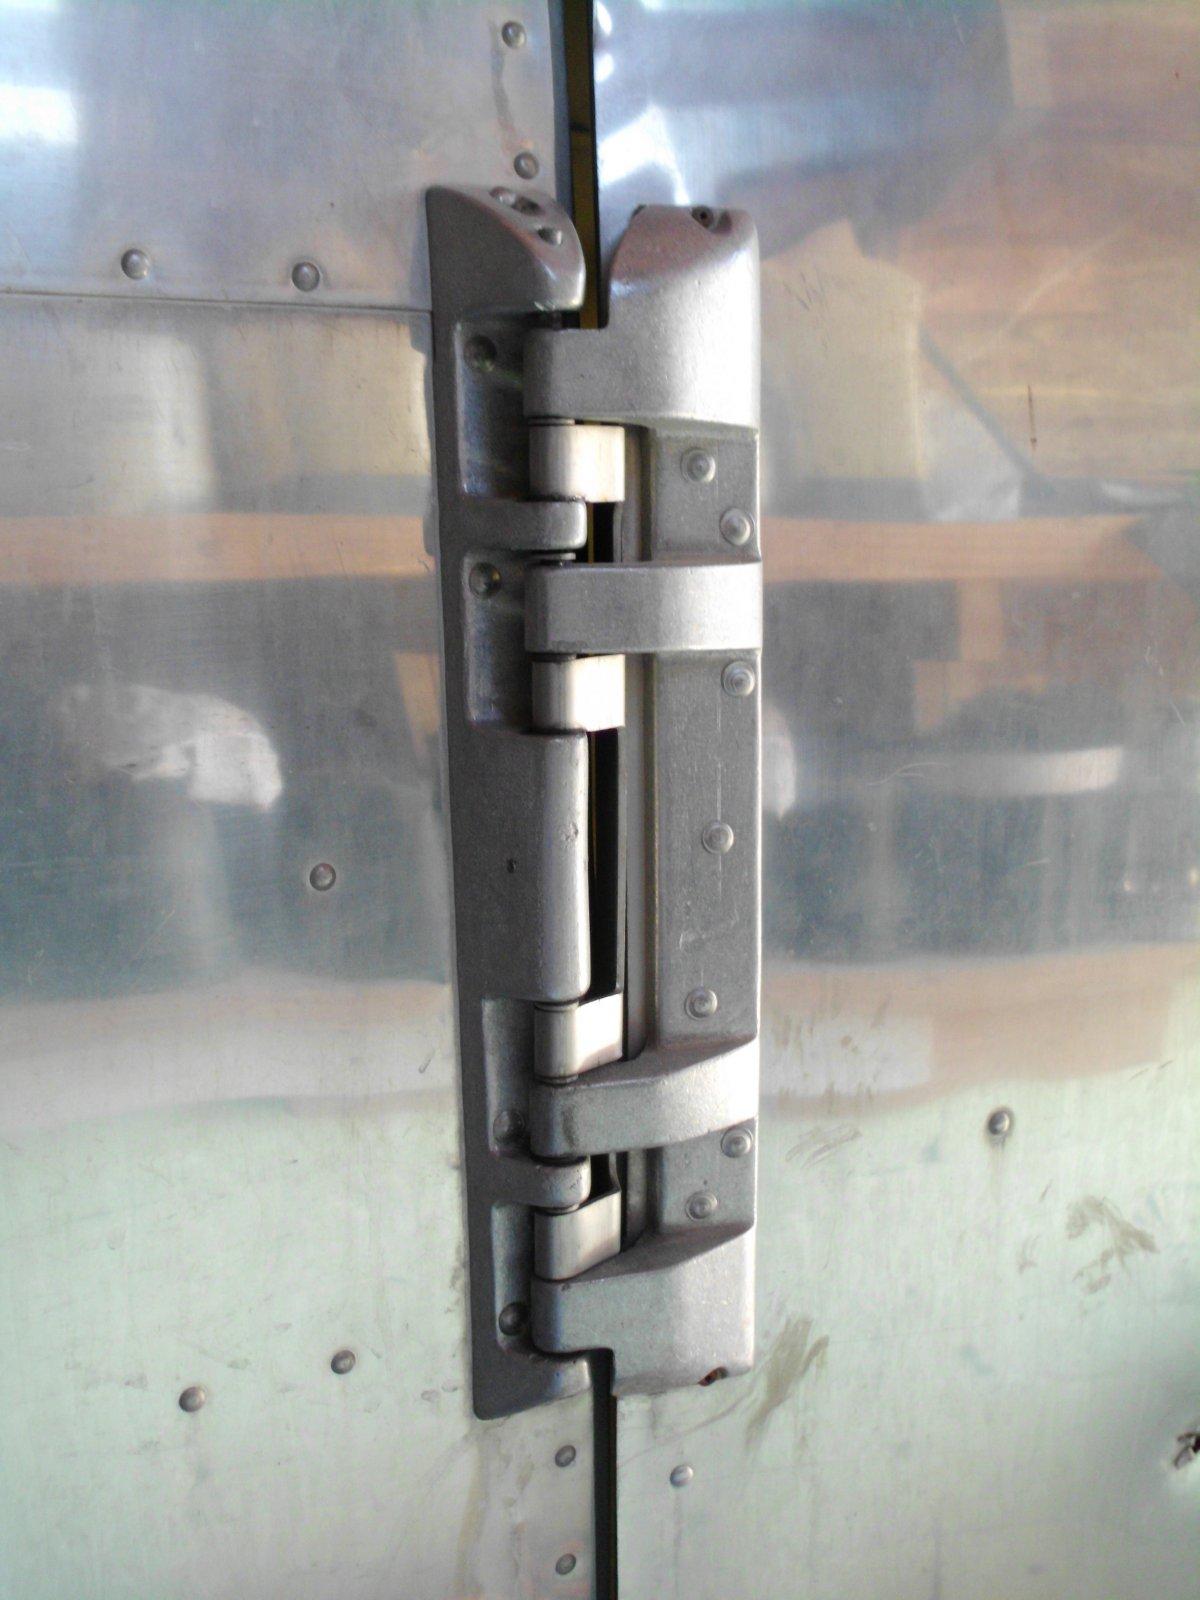 Click image for larger version  Name:door hinge.jpg Views:94 Size:188.0 KB ID:134000